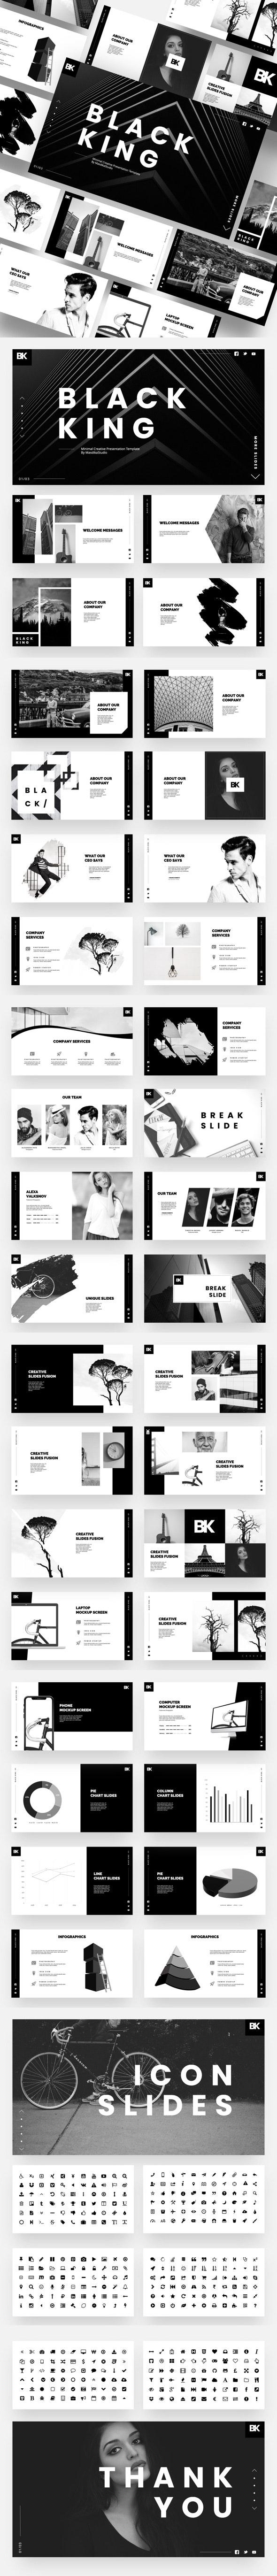 Black King - Minimal Creative Google Slides Template - Google Slides Presentation Templates